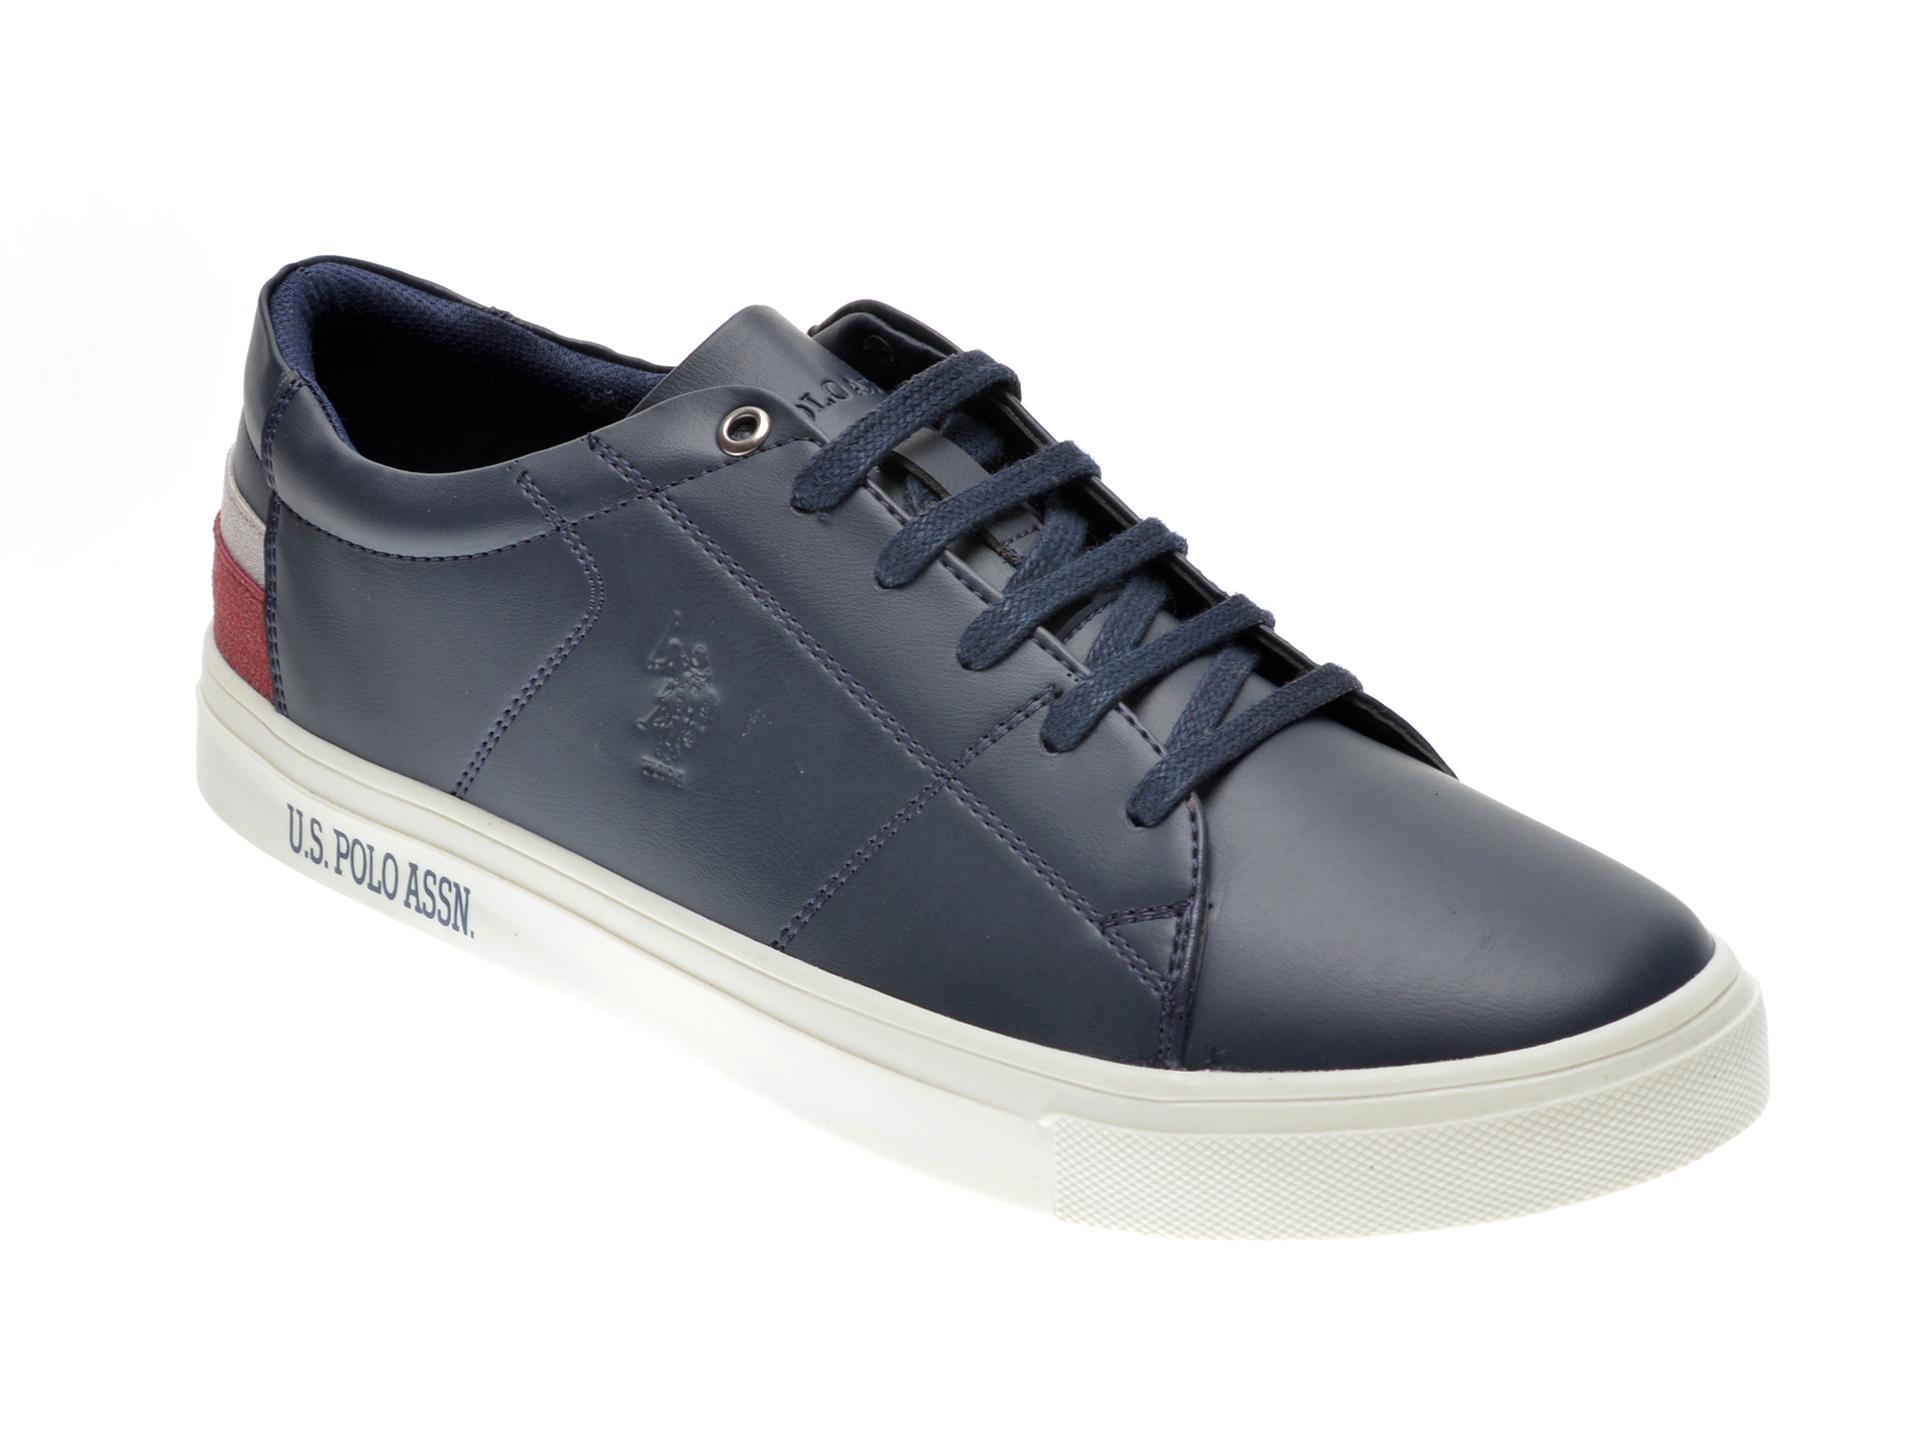 Pantofi Sport Us Polo Assn Bleumarin, 422447, Din Piele Ecologica